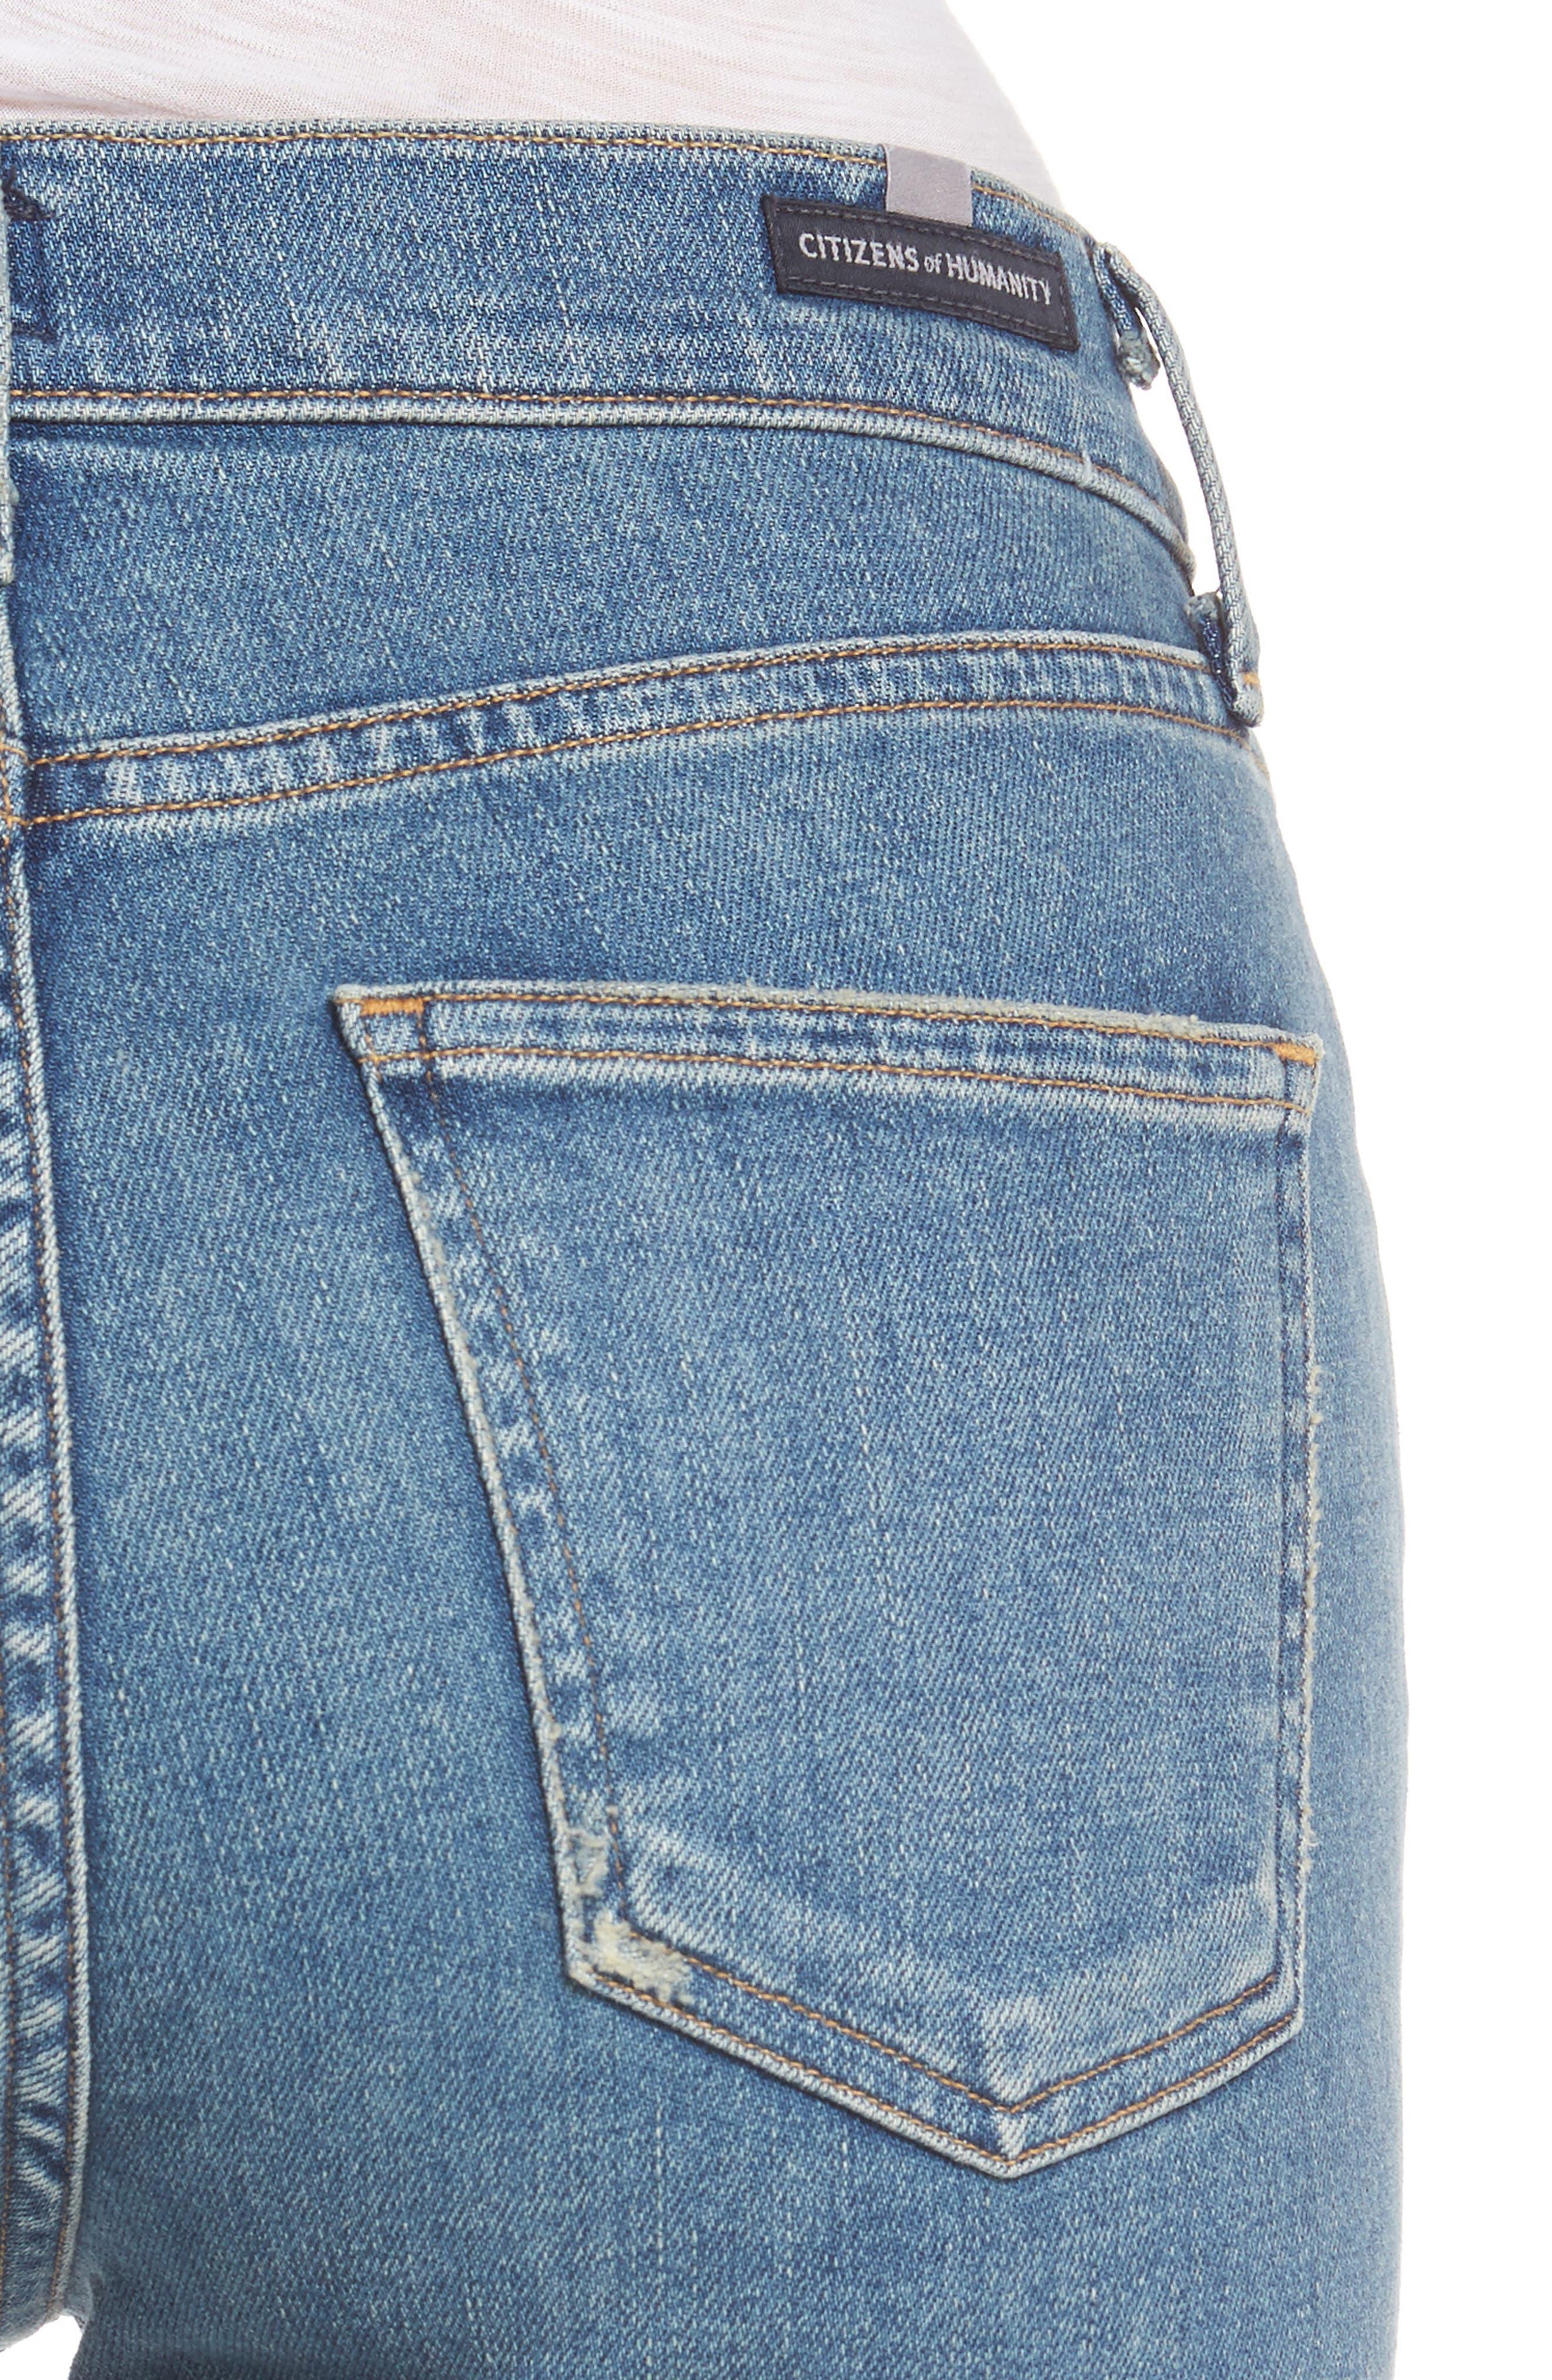 Alternate Image 4  - Citizens of Humanity Rocket High Waist Skinny Jeans (Reyes)